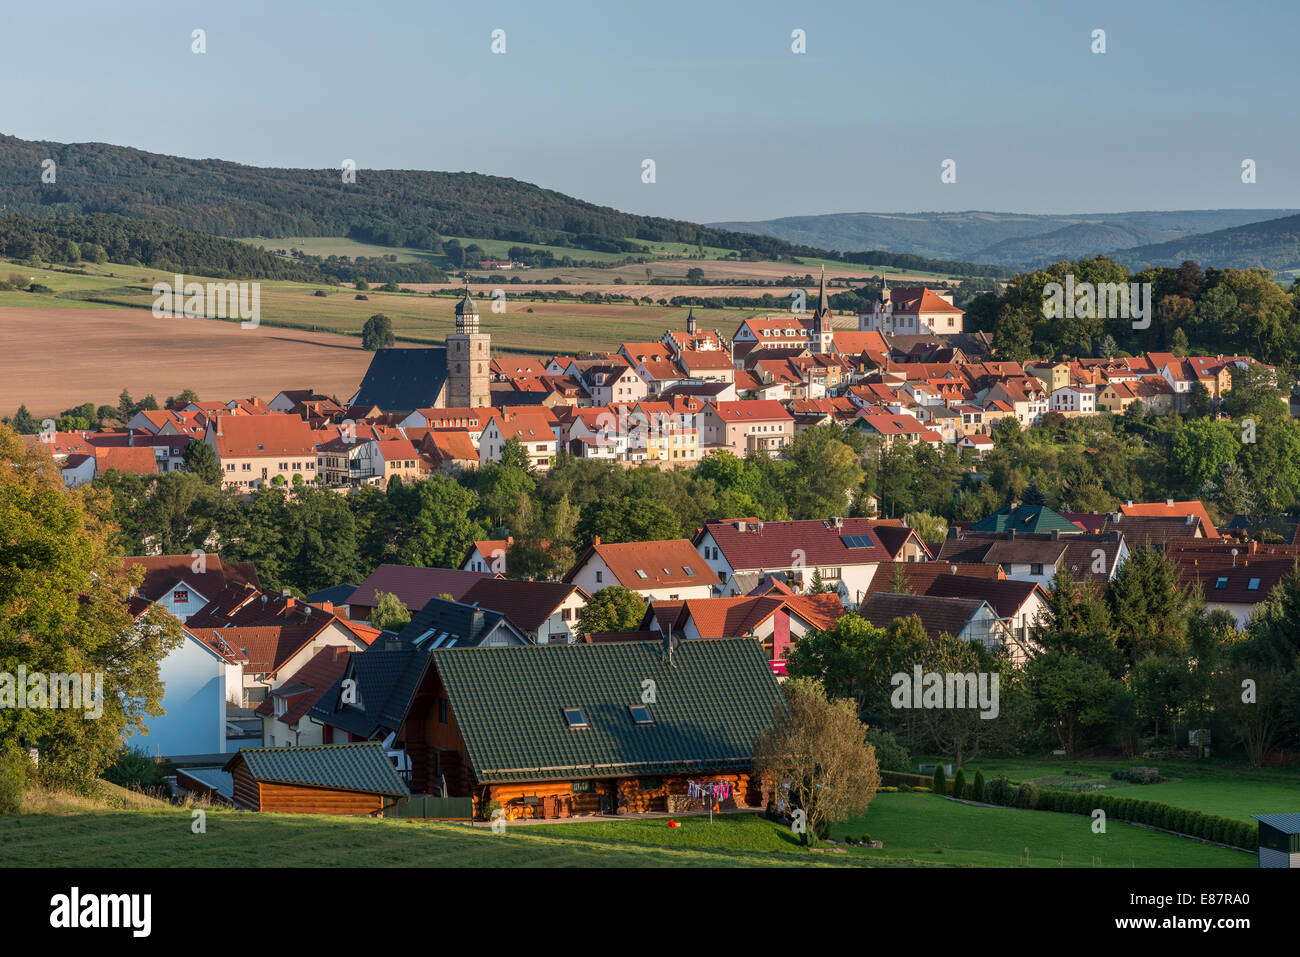 View of the town of Geysa, former restricted area, inner German border, near Gedenktstätte Point Alpha Memorial, - Stock Image